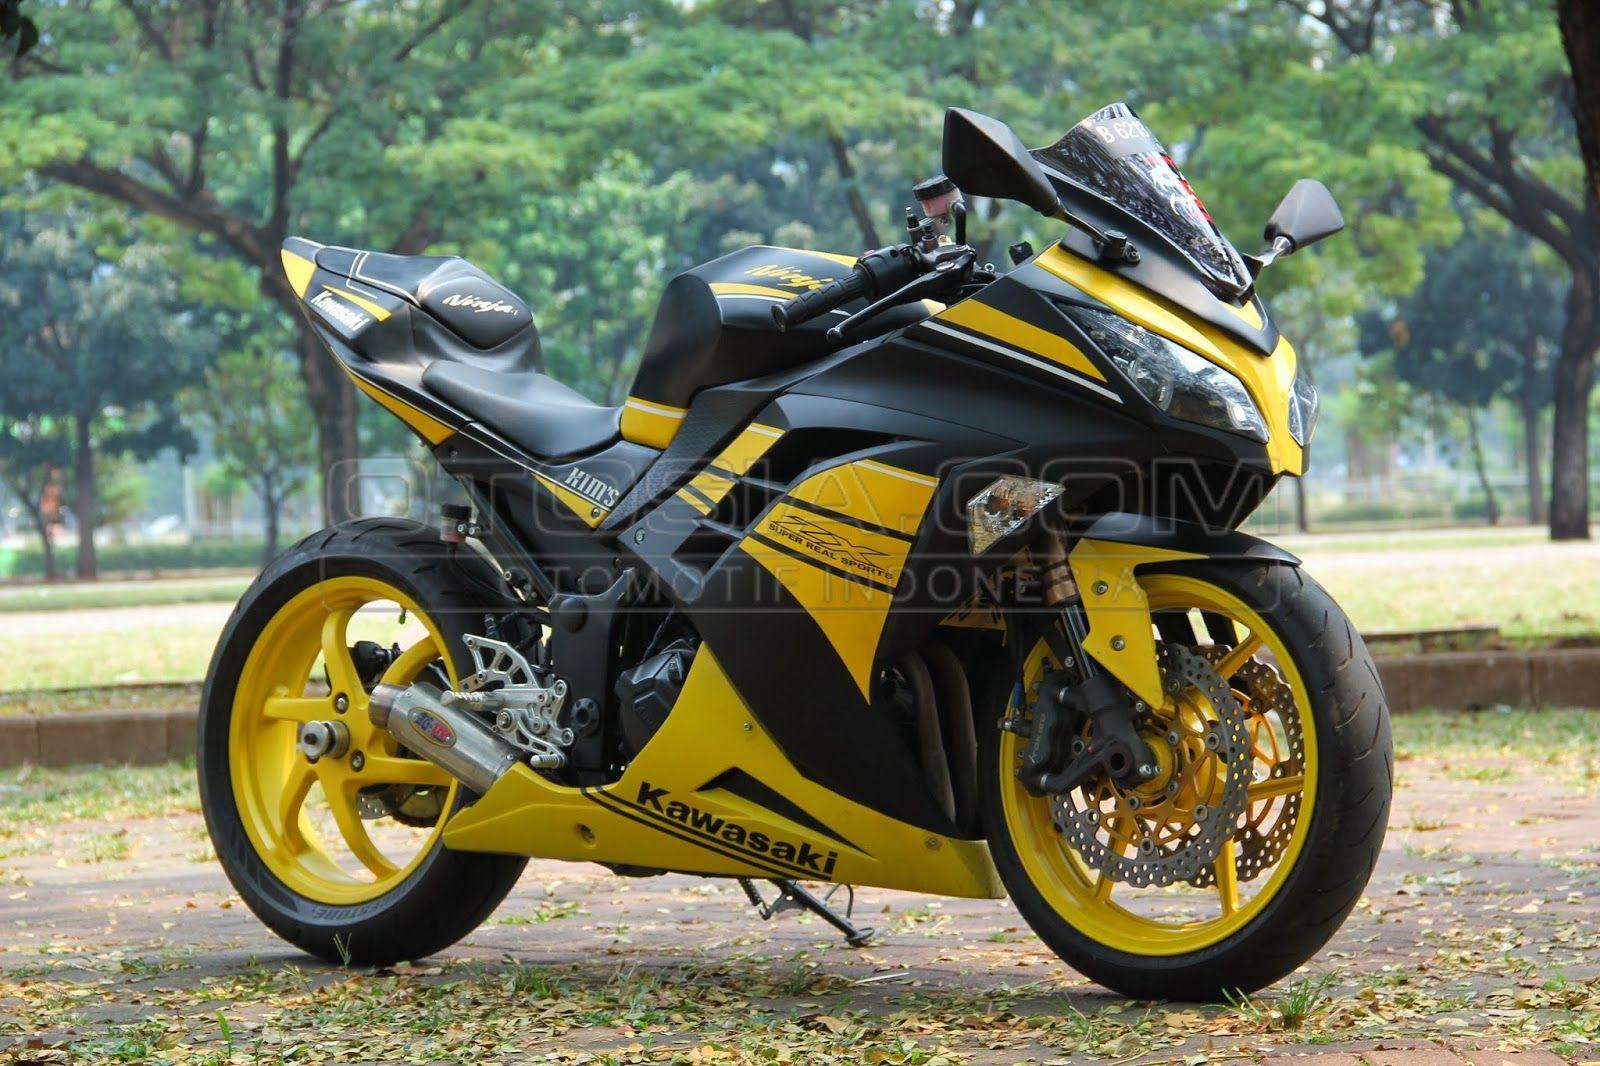 Modifikasi Motor Ninja Terbaru Kawasaki ninja 250r